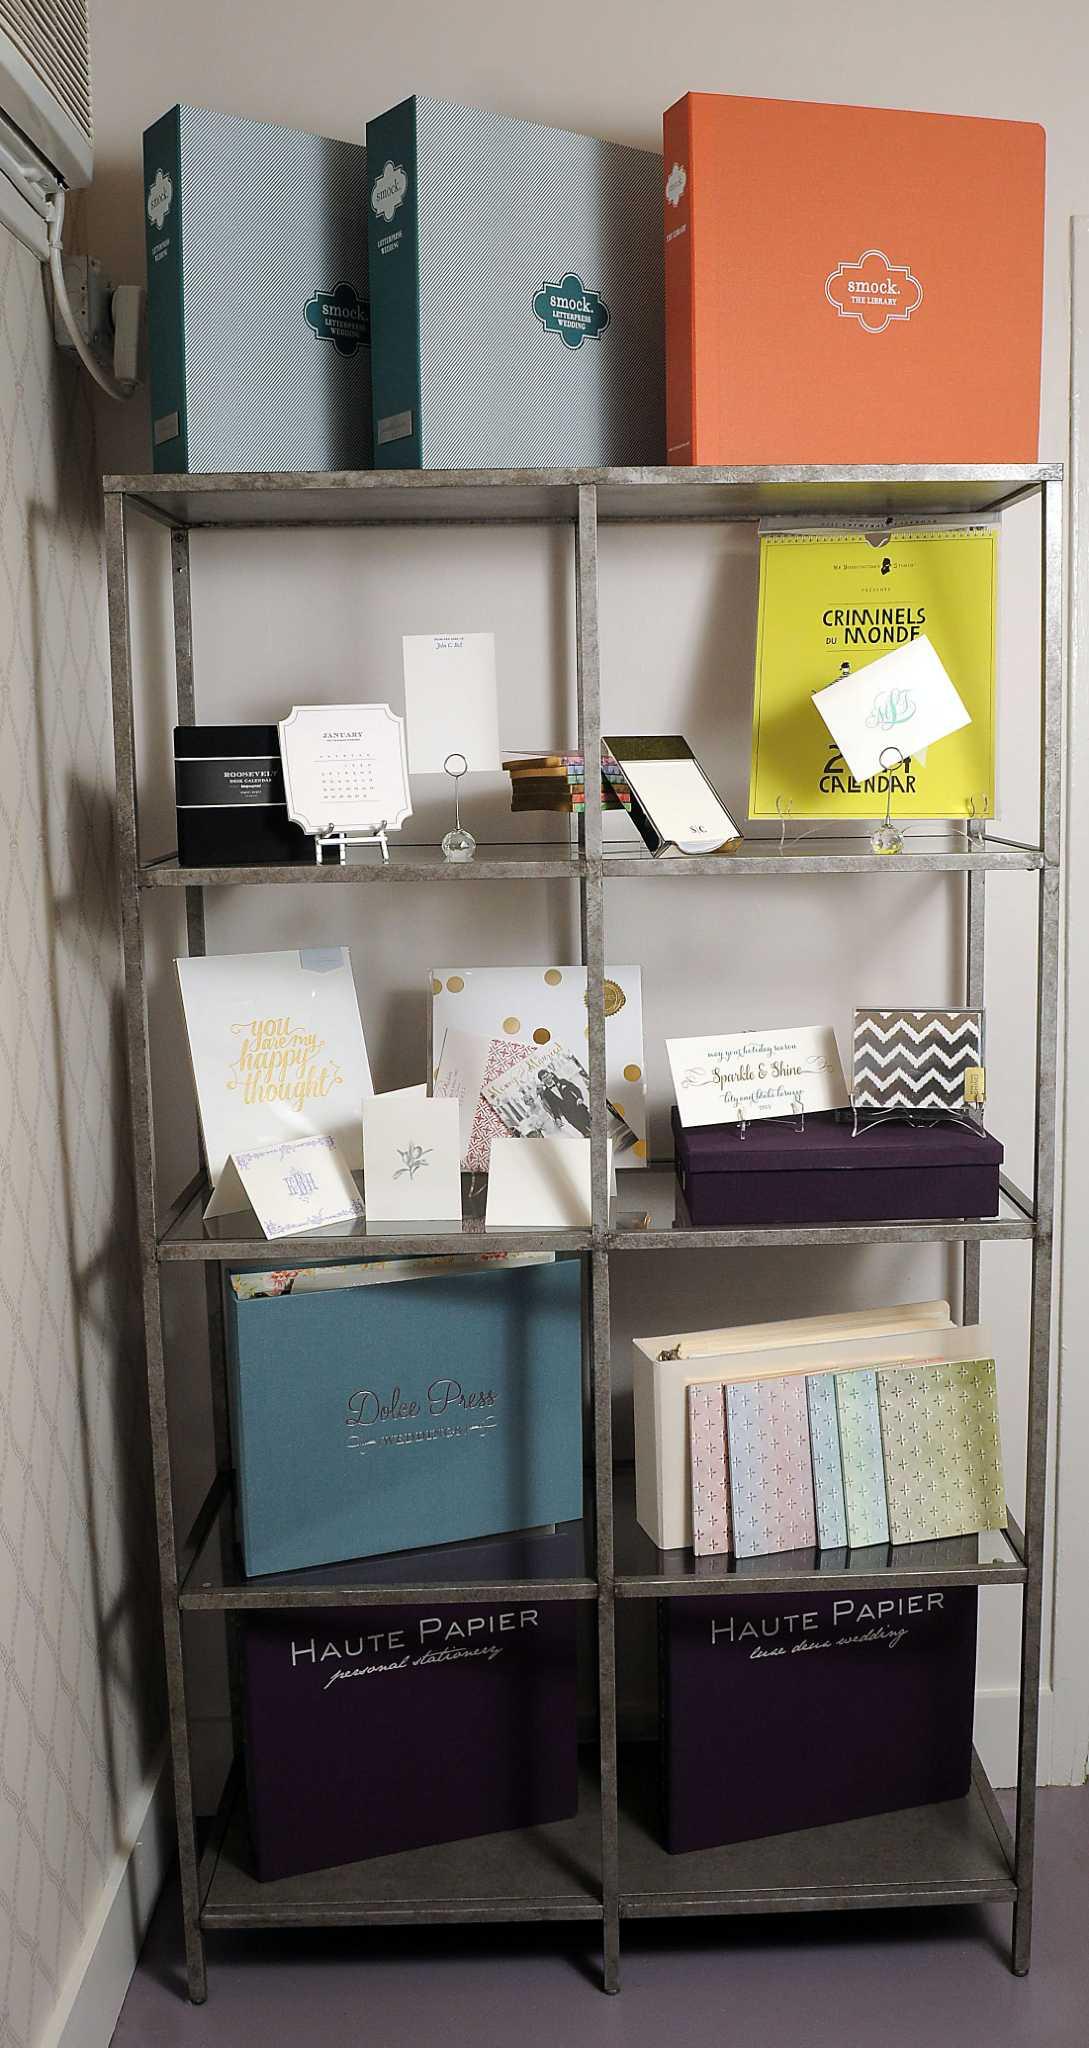 Montrose home décor store has new tiny store inside